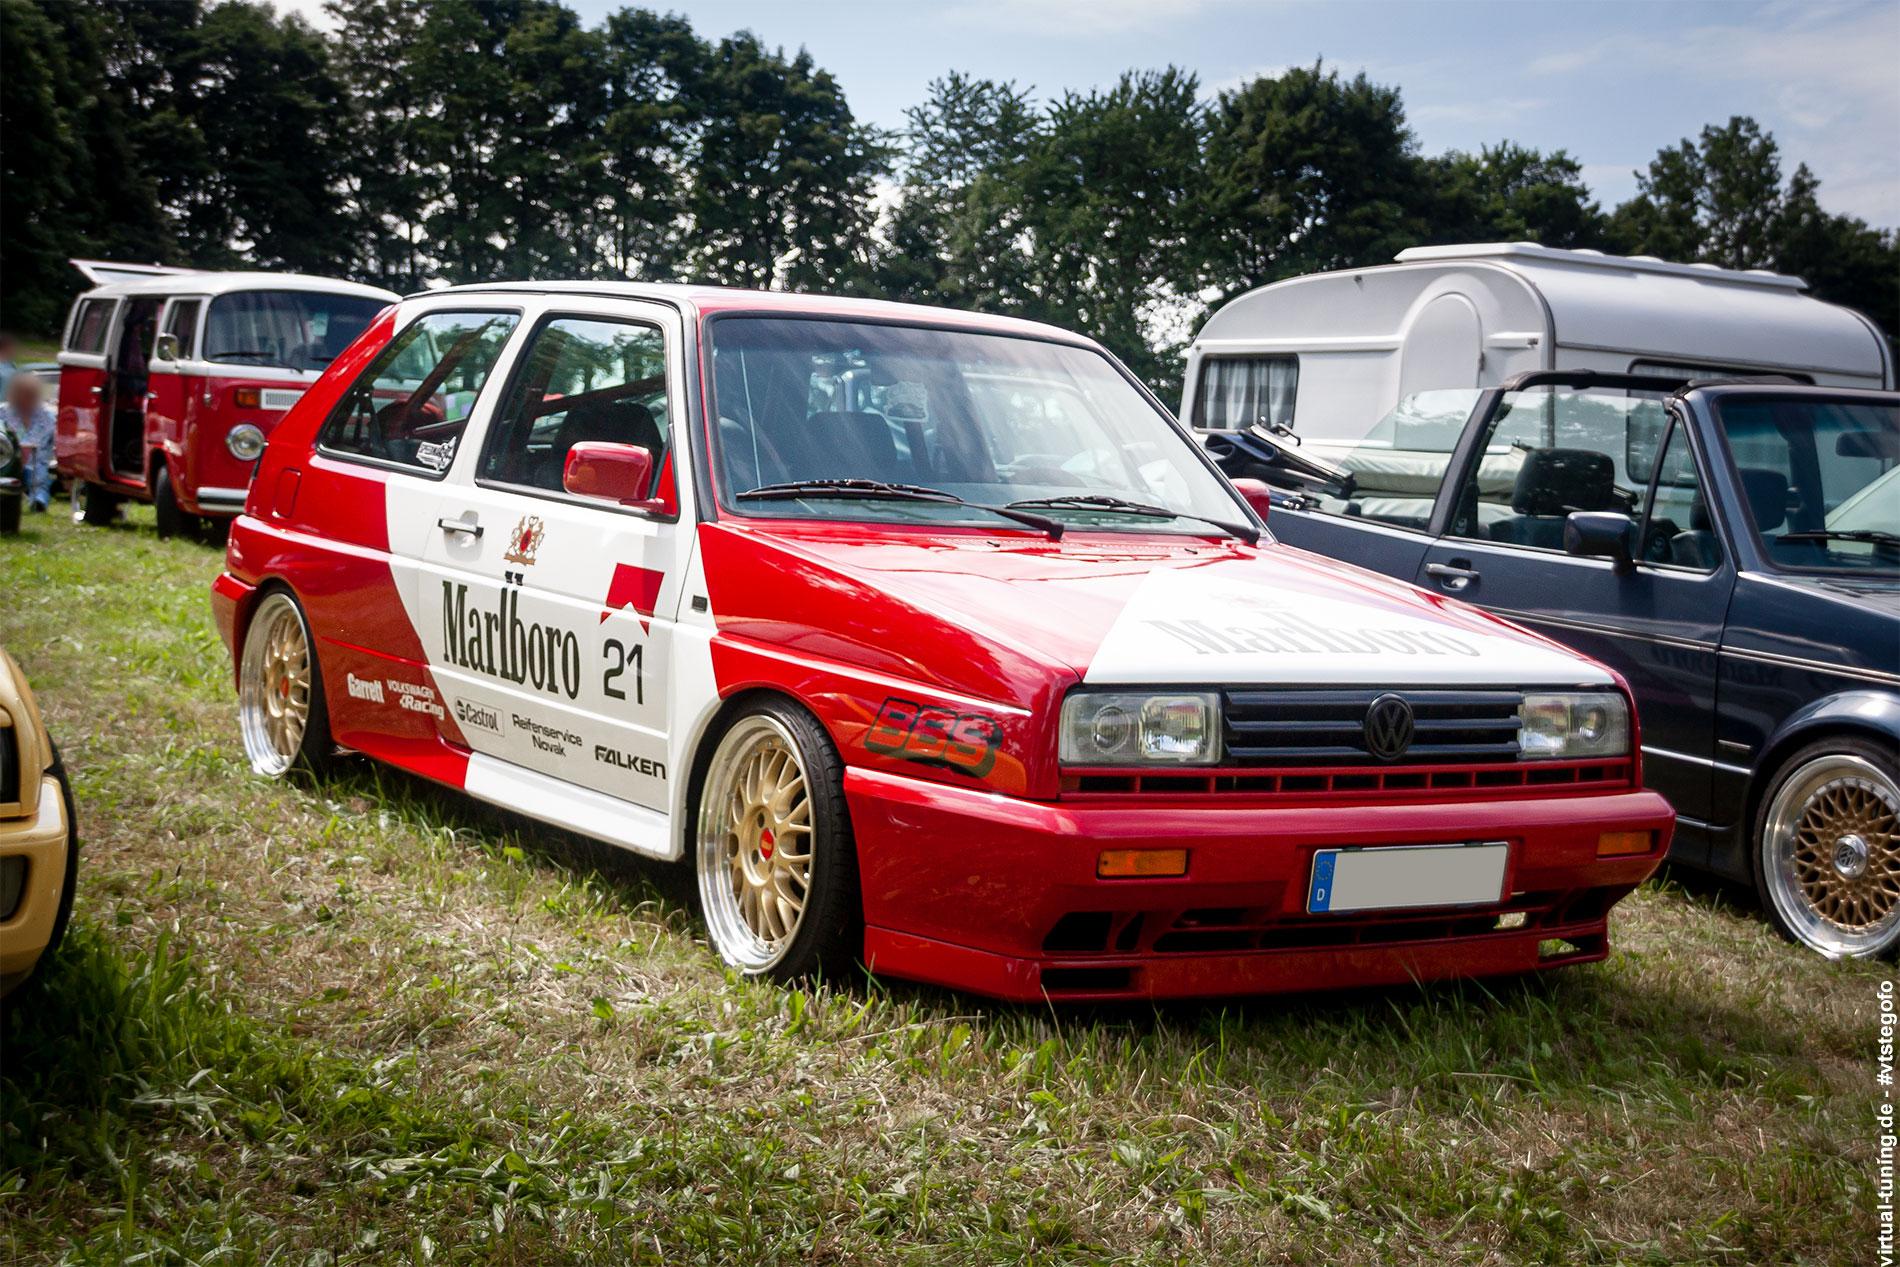 Volkswagen Rallye Golf - 4. Sadisdorfer ü30 Treffen (07.2021)